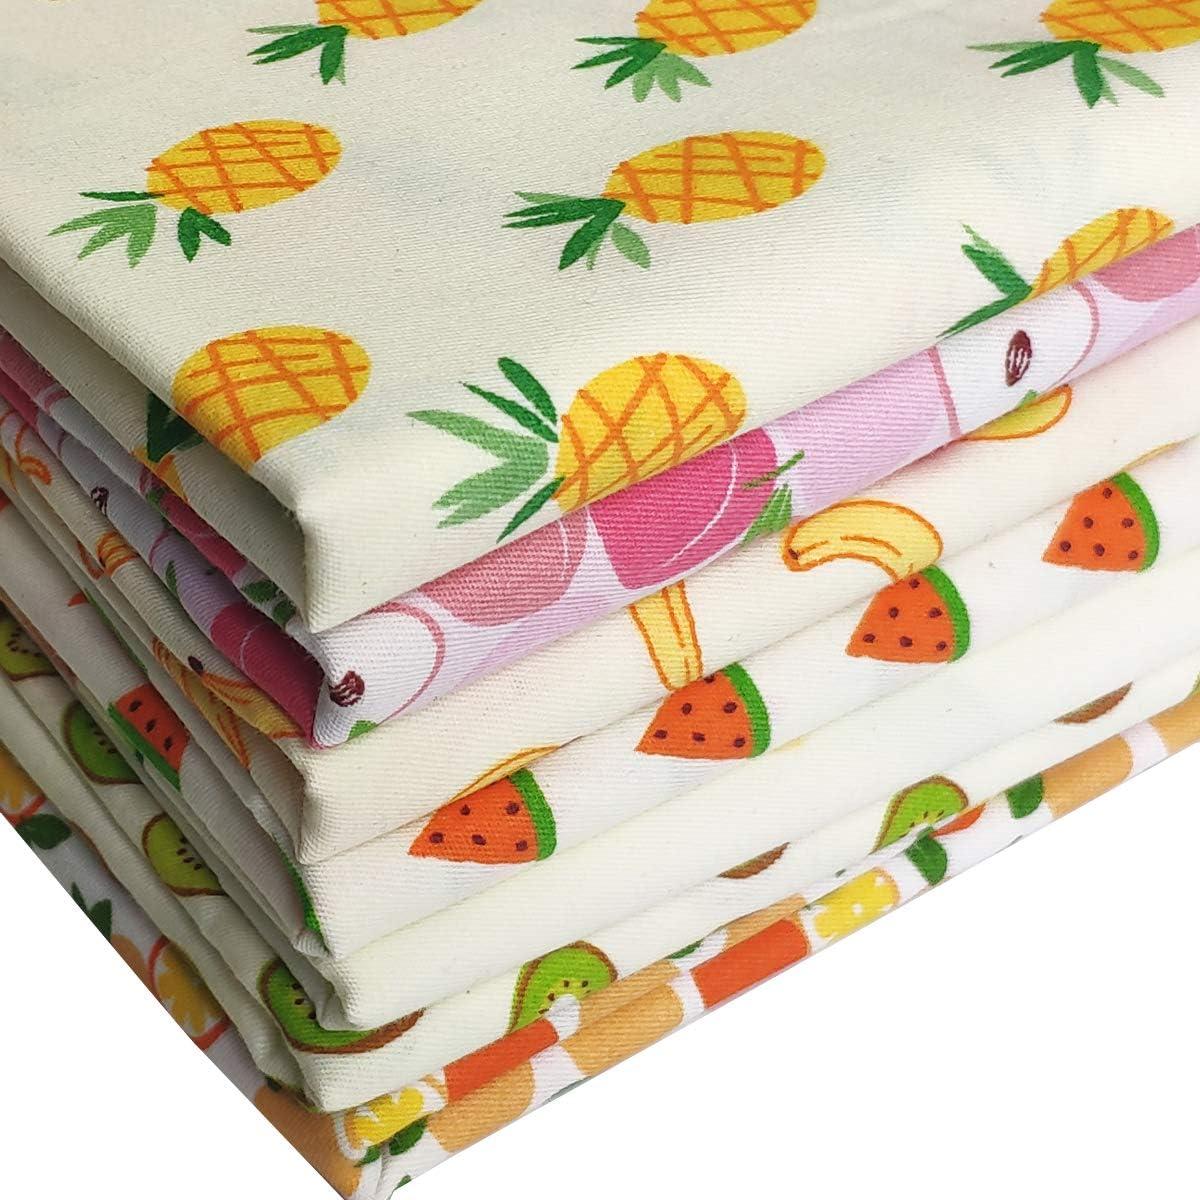 Fruit Blue Fabric Apple Pineapple Cherries Banana Watermelon Fruit Salad Apparel Quilting Cotton Fabric a228